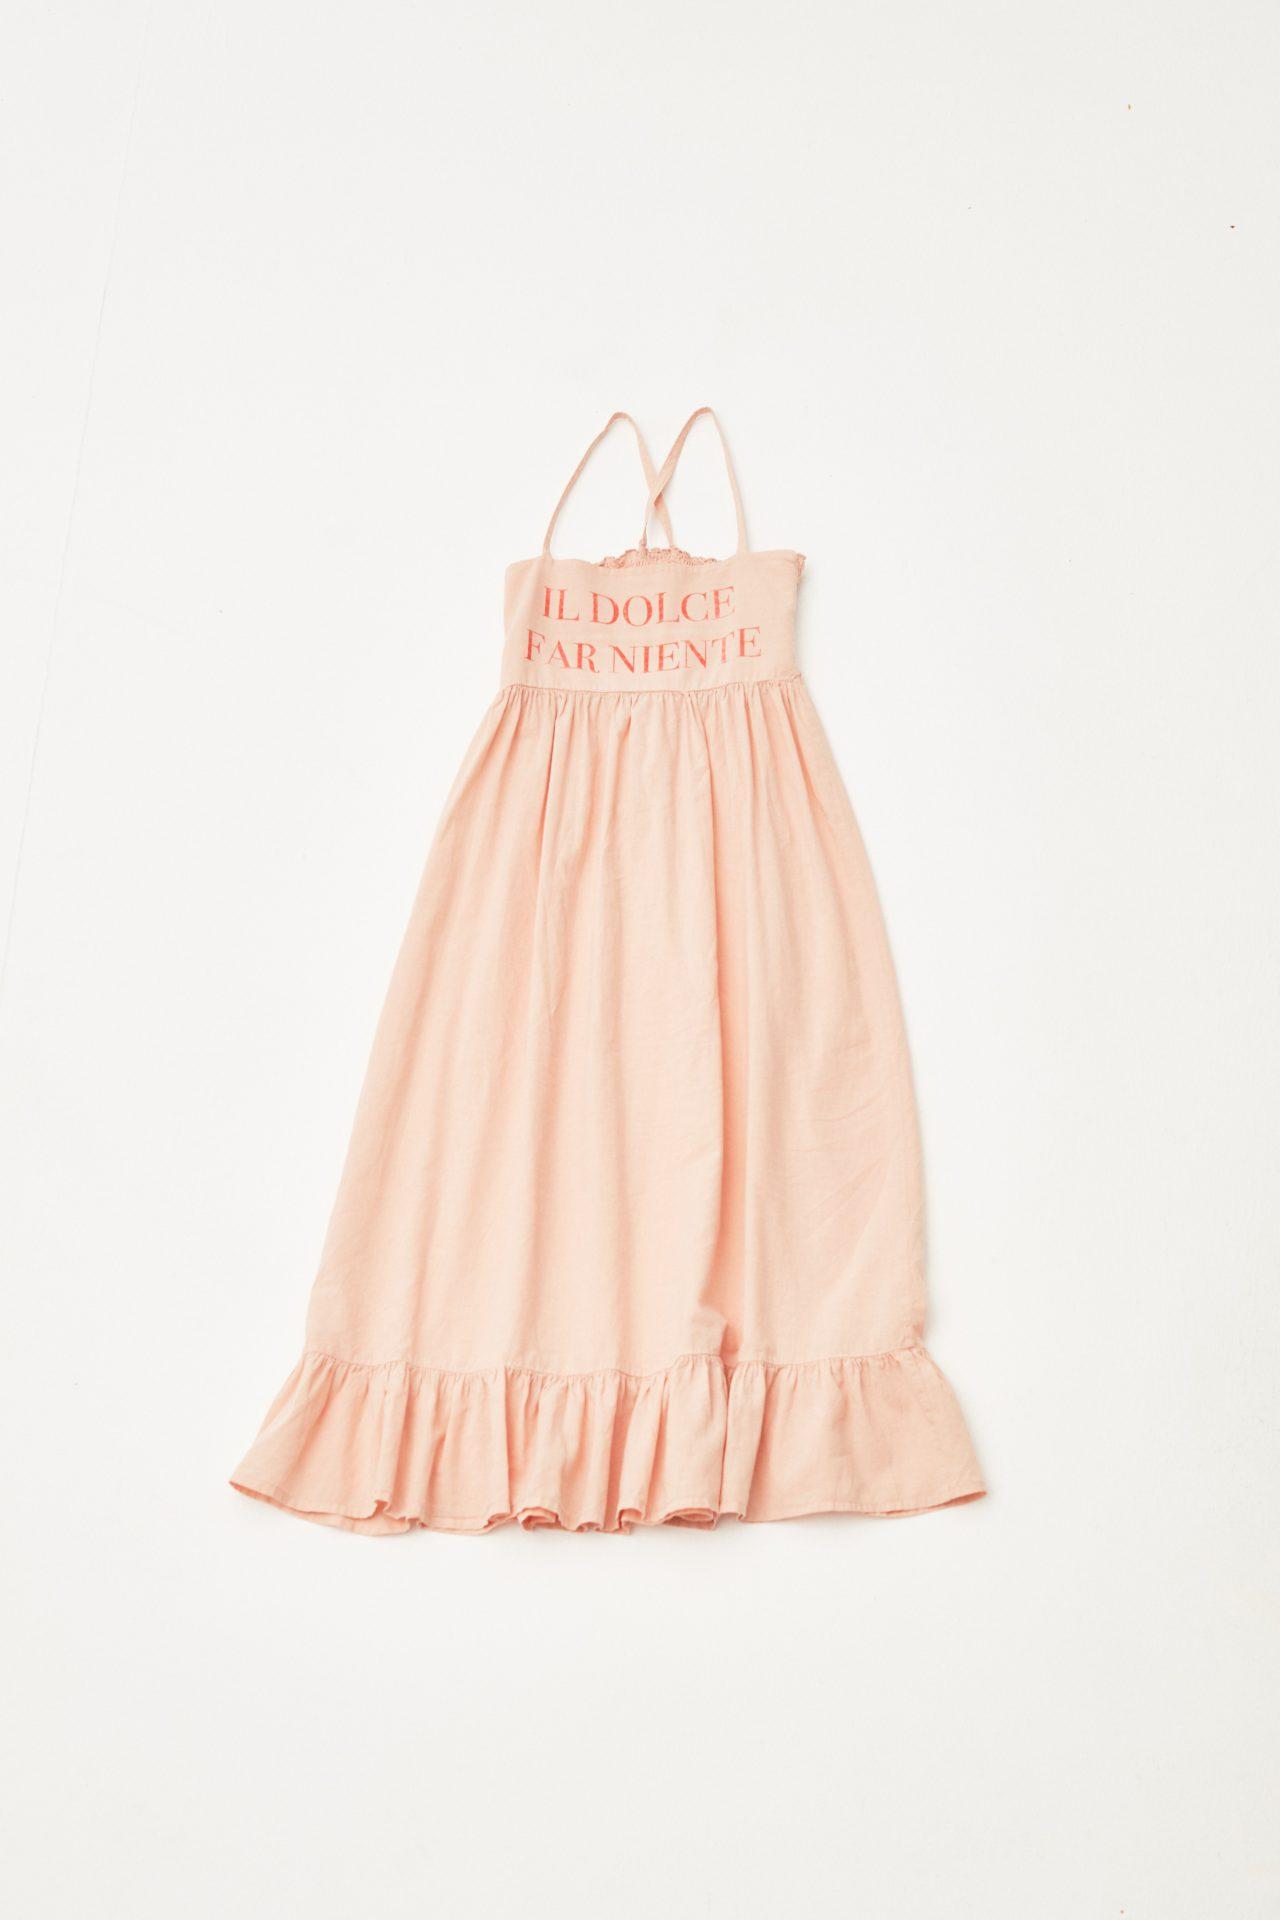 Il Dolce Far Niente Dress